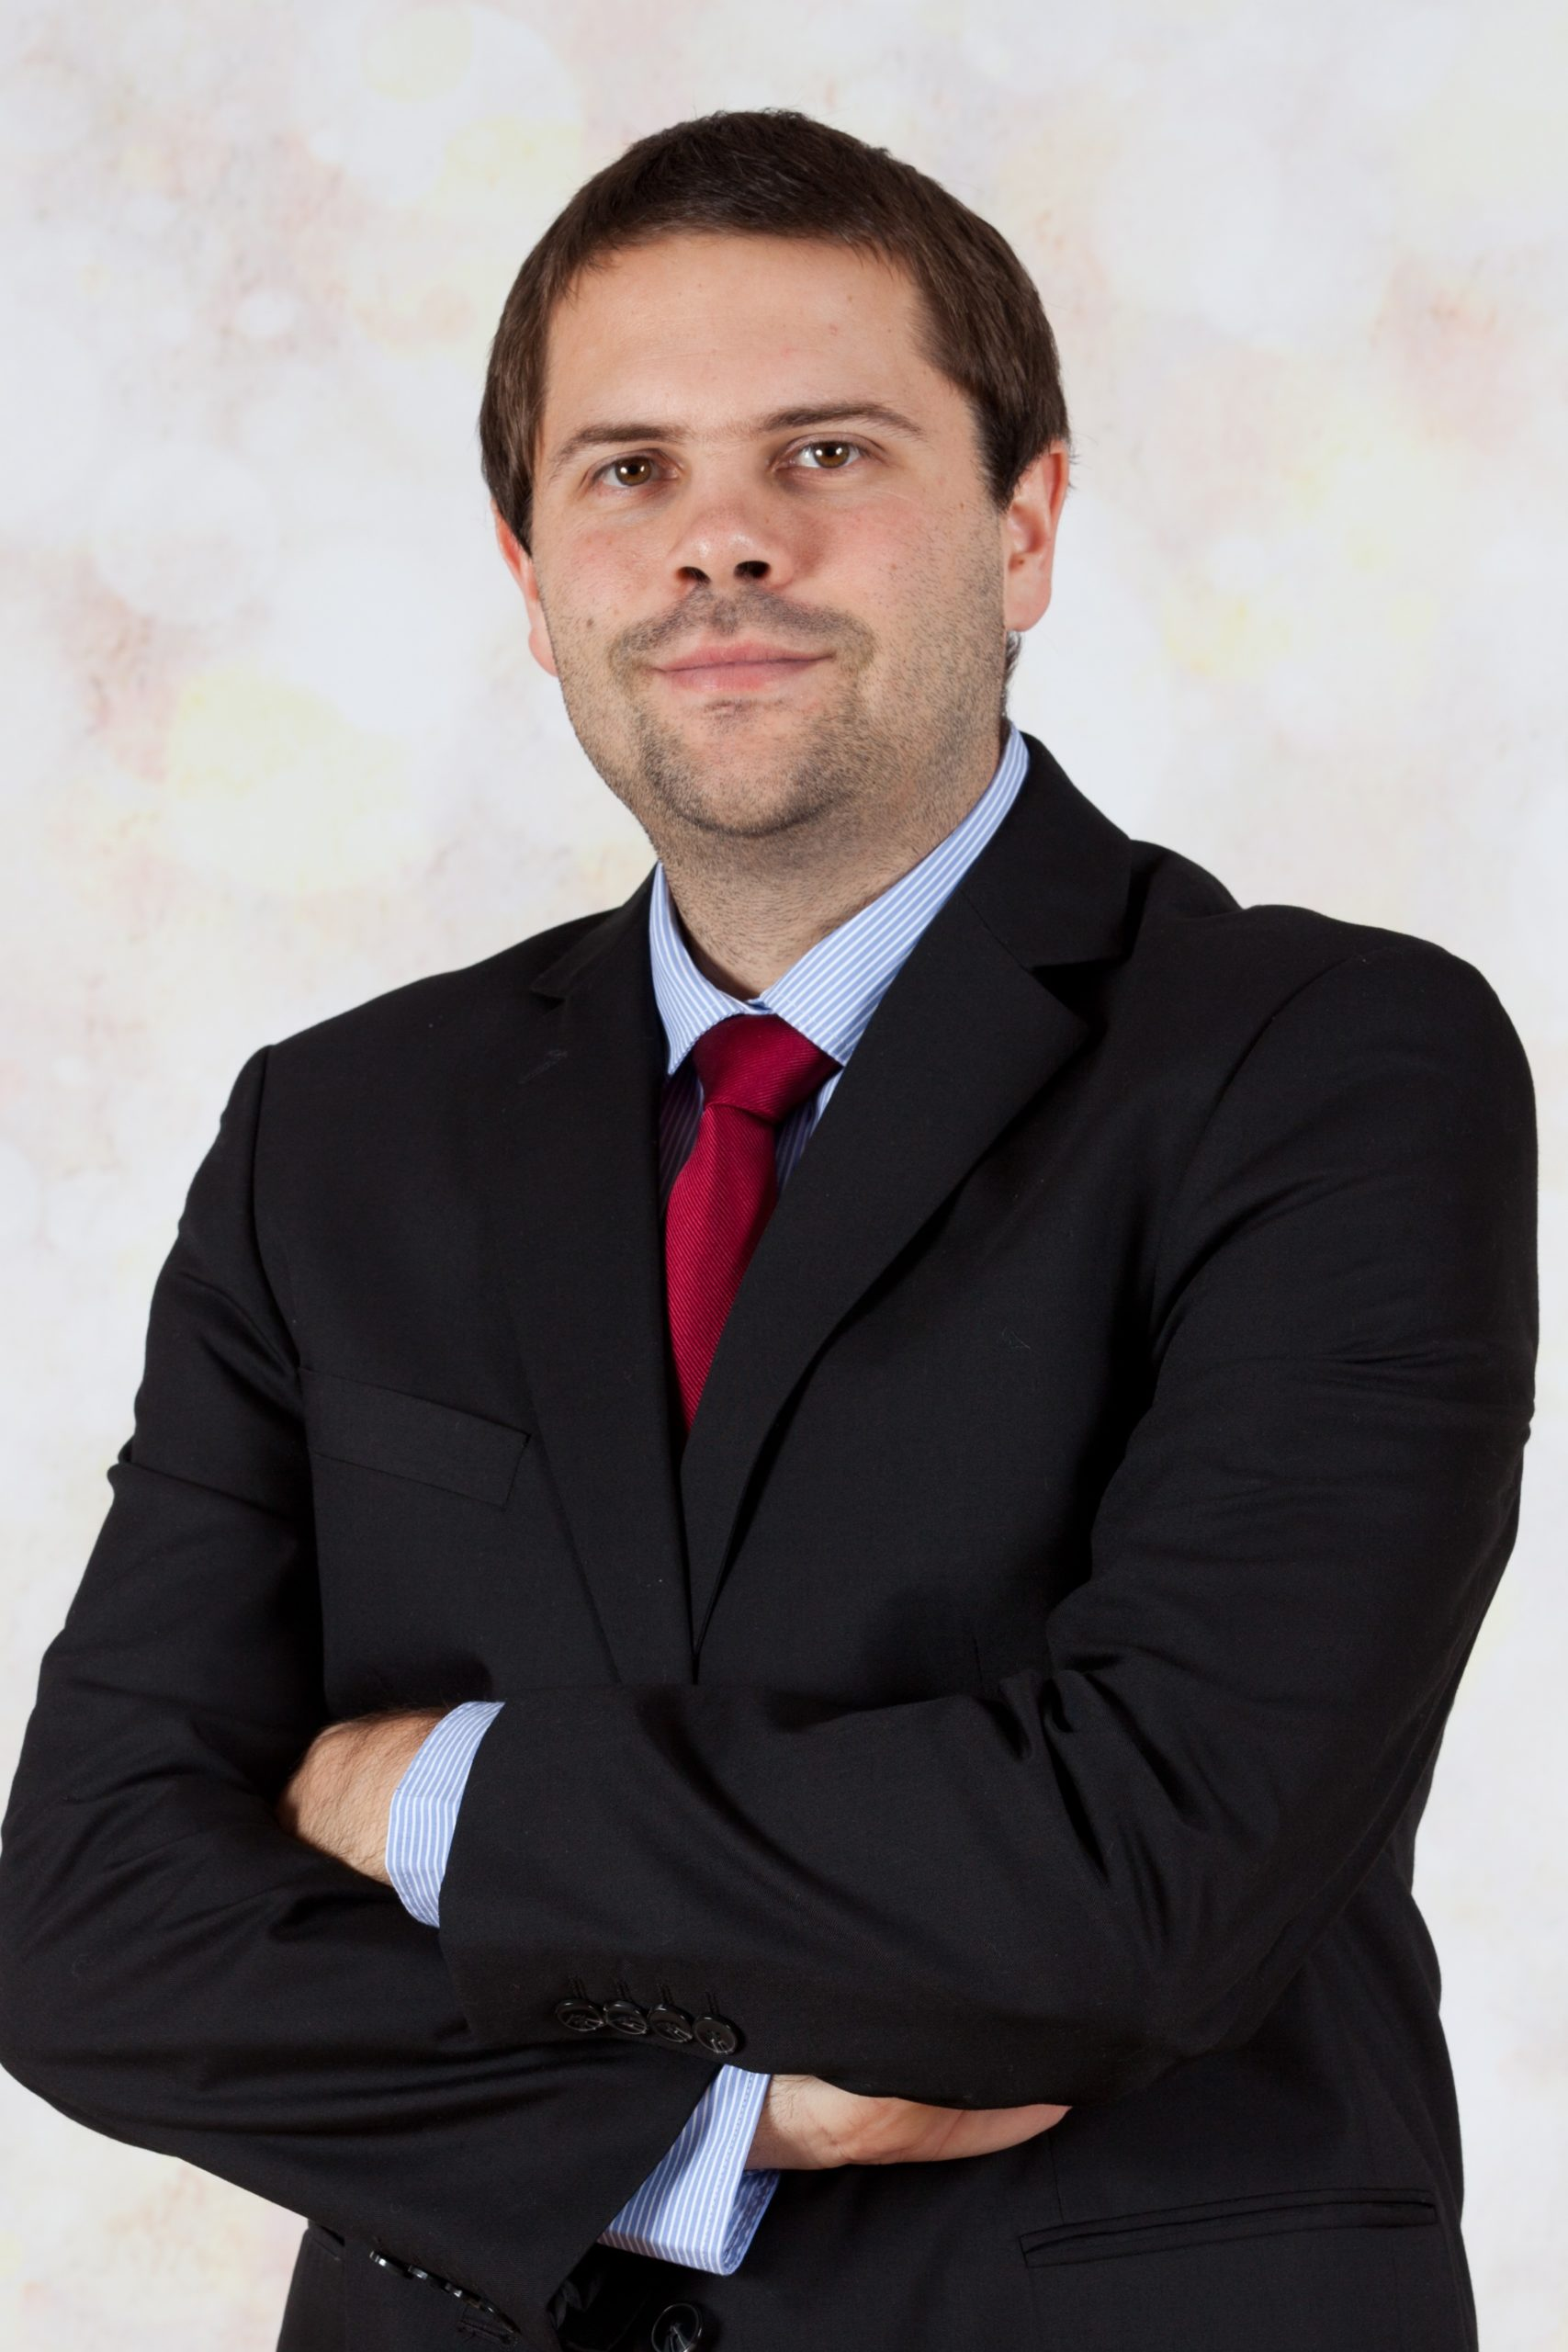 Rechtsanwalt Thomas Hummel vertritt Ihre Verfassungsbeschwerde oder Menschenrechtsbeschwerde aus dem Strafrecht.